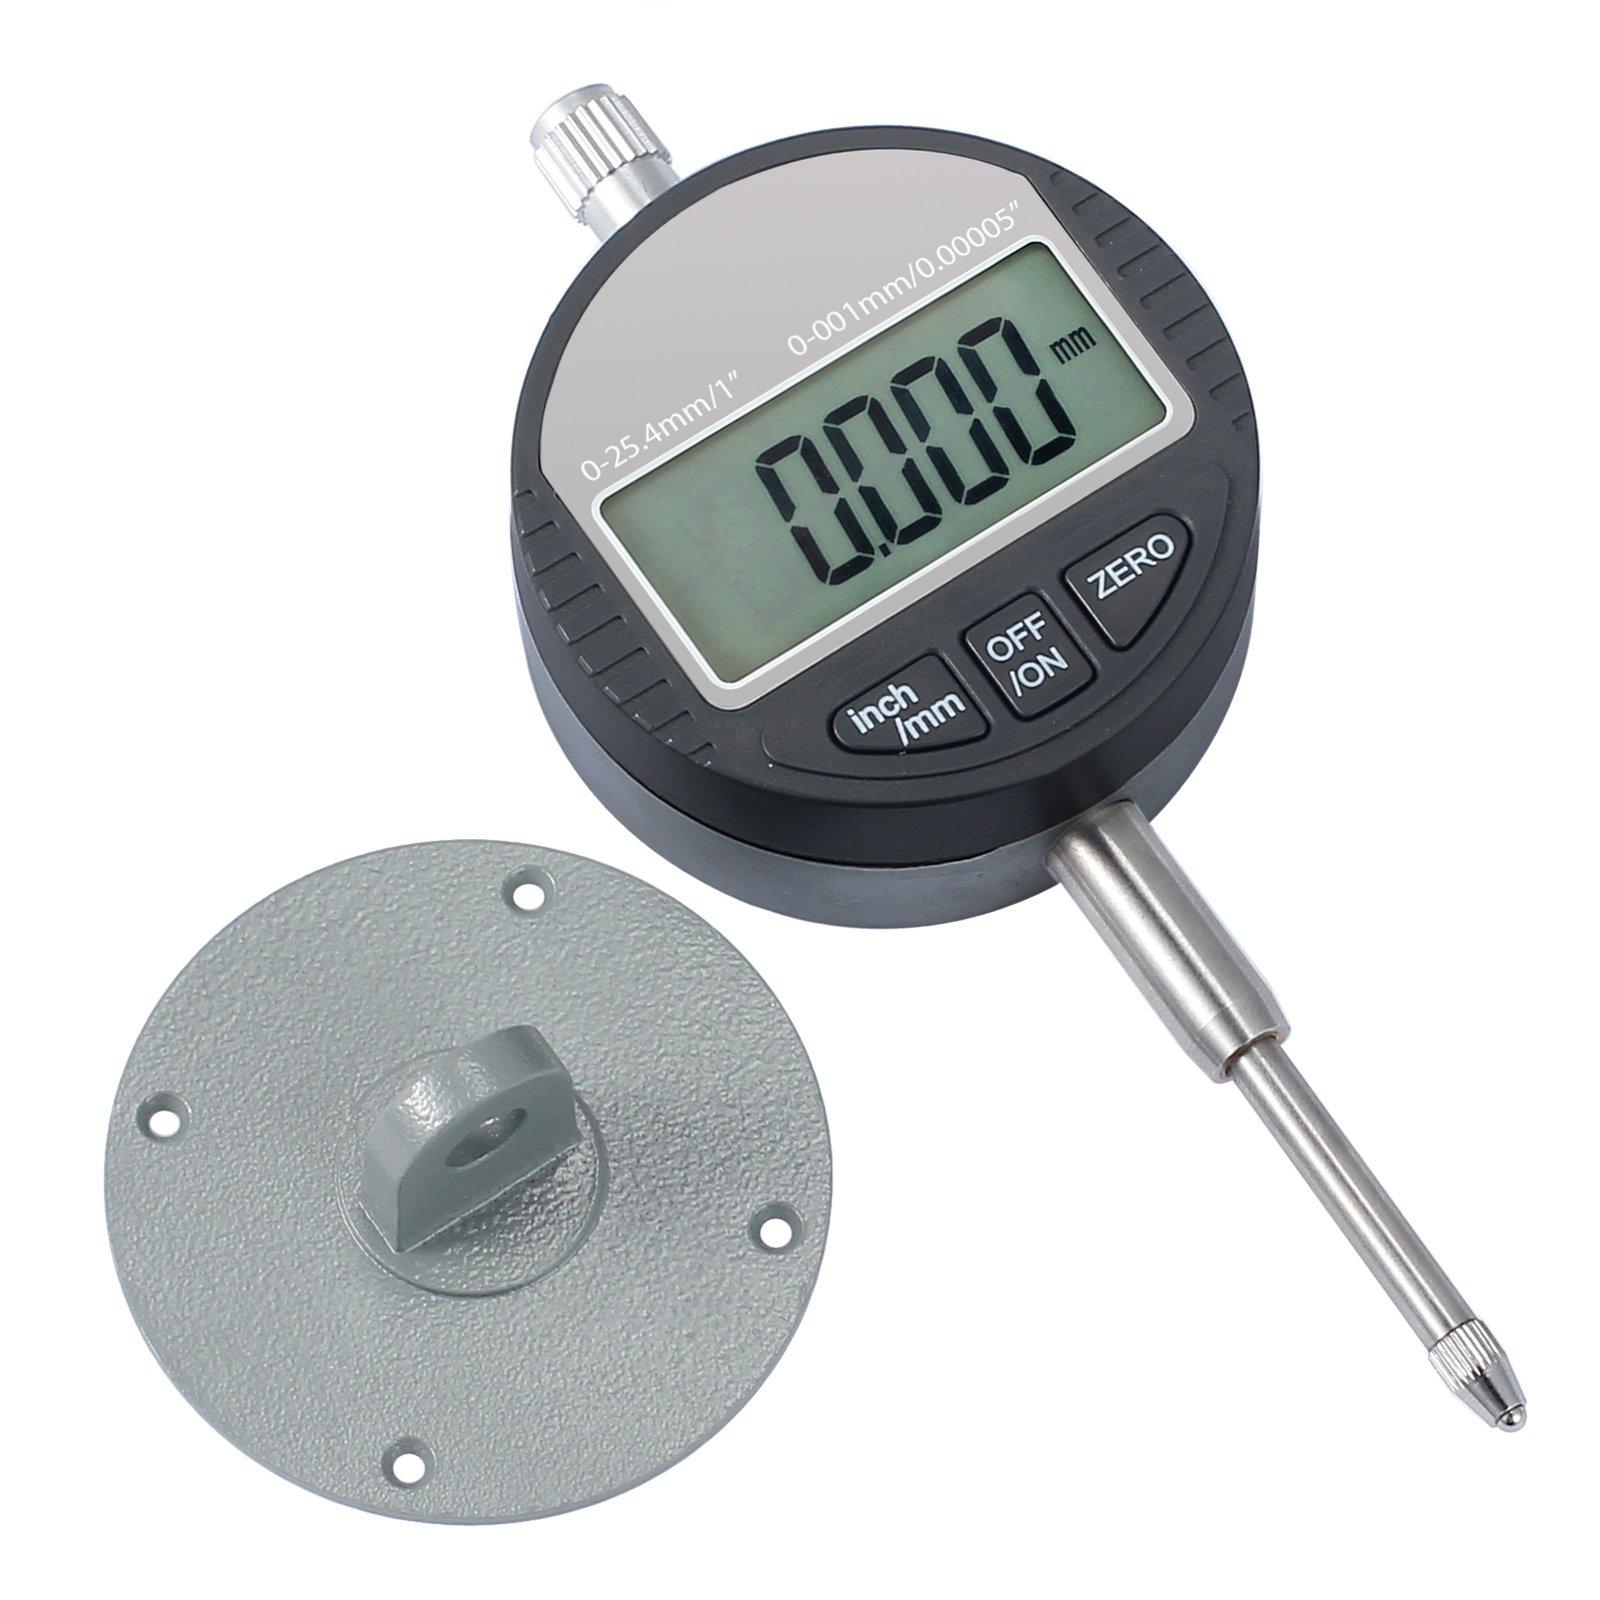 "Rhinoco Digital Dial Indicator 0.001/0.00005'' 0-1"" Digital Electronic Indicator Dial Test Gauge Range 0-25.4mm with Large LCD Display"